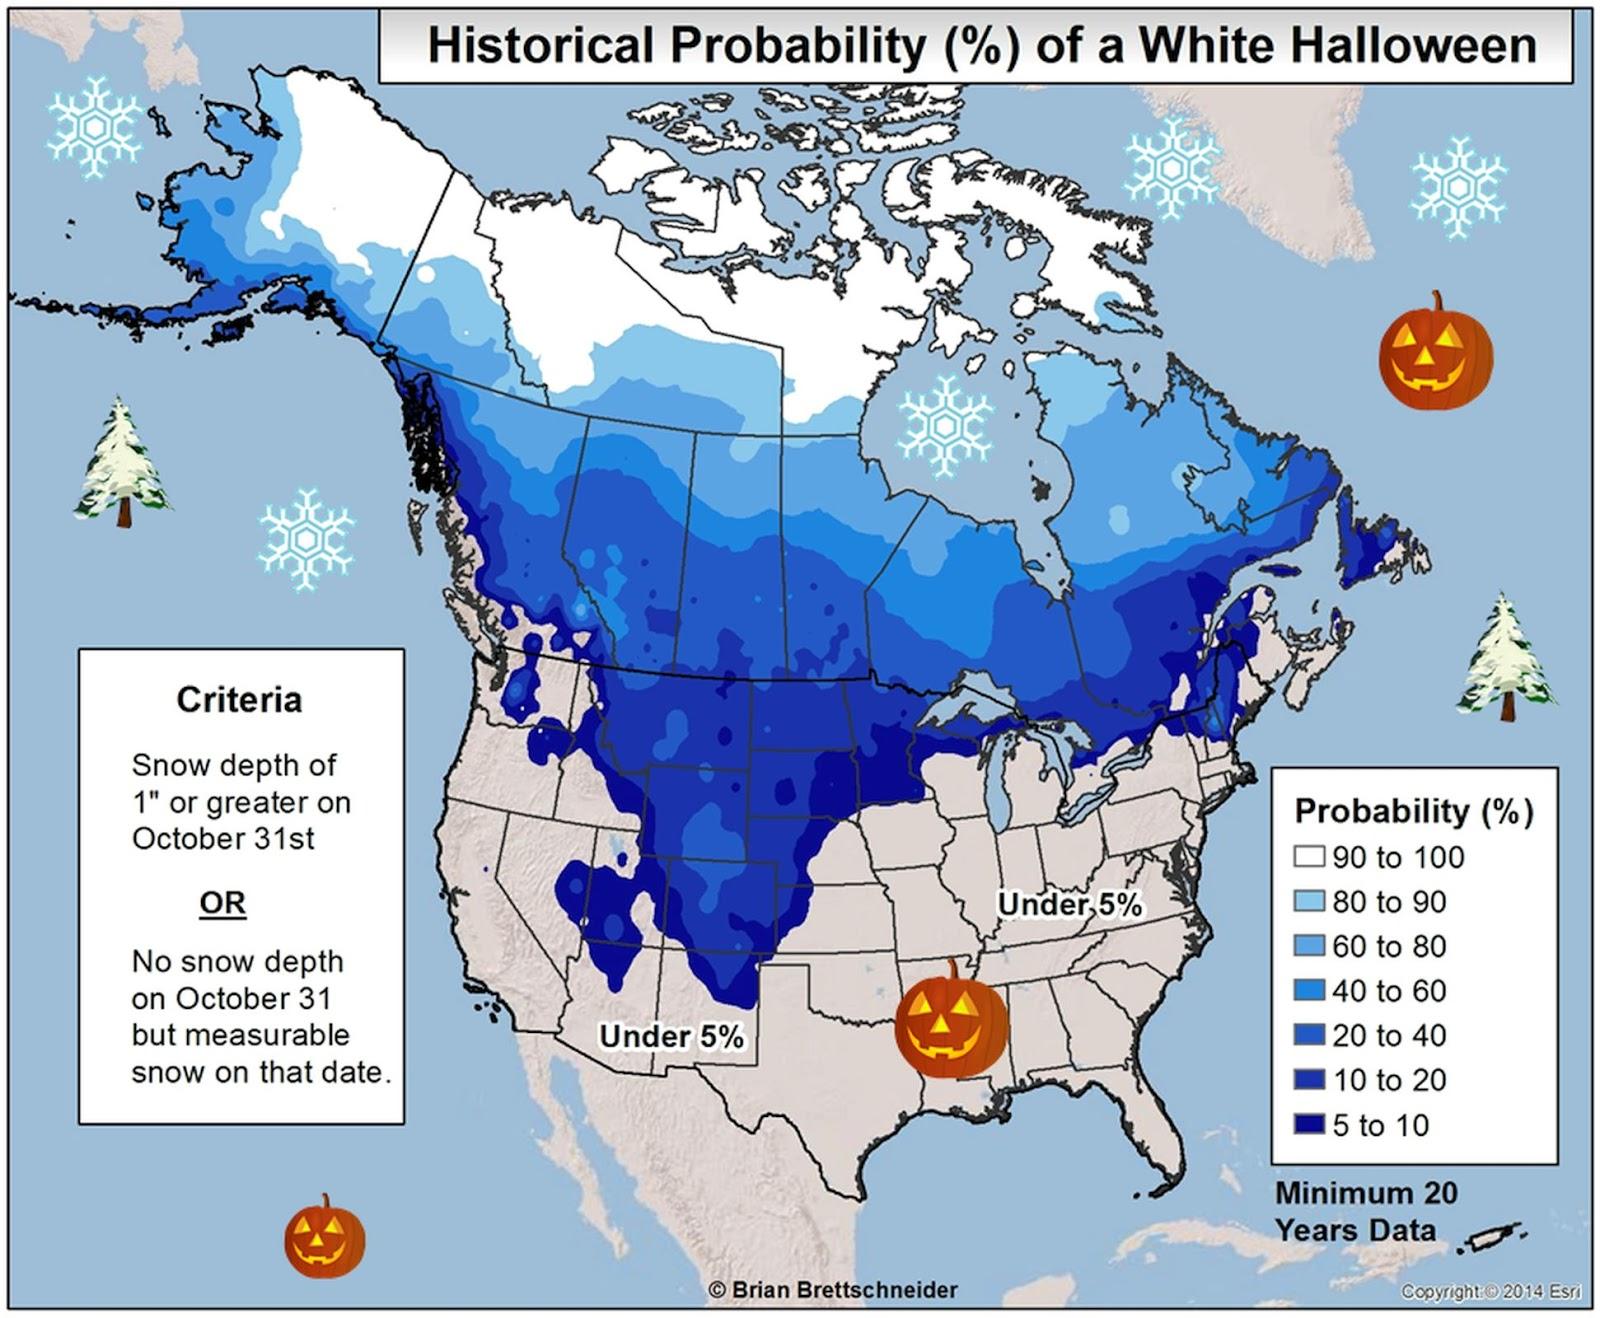 Historical probability of white Halloween